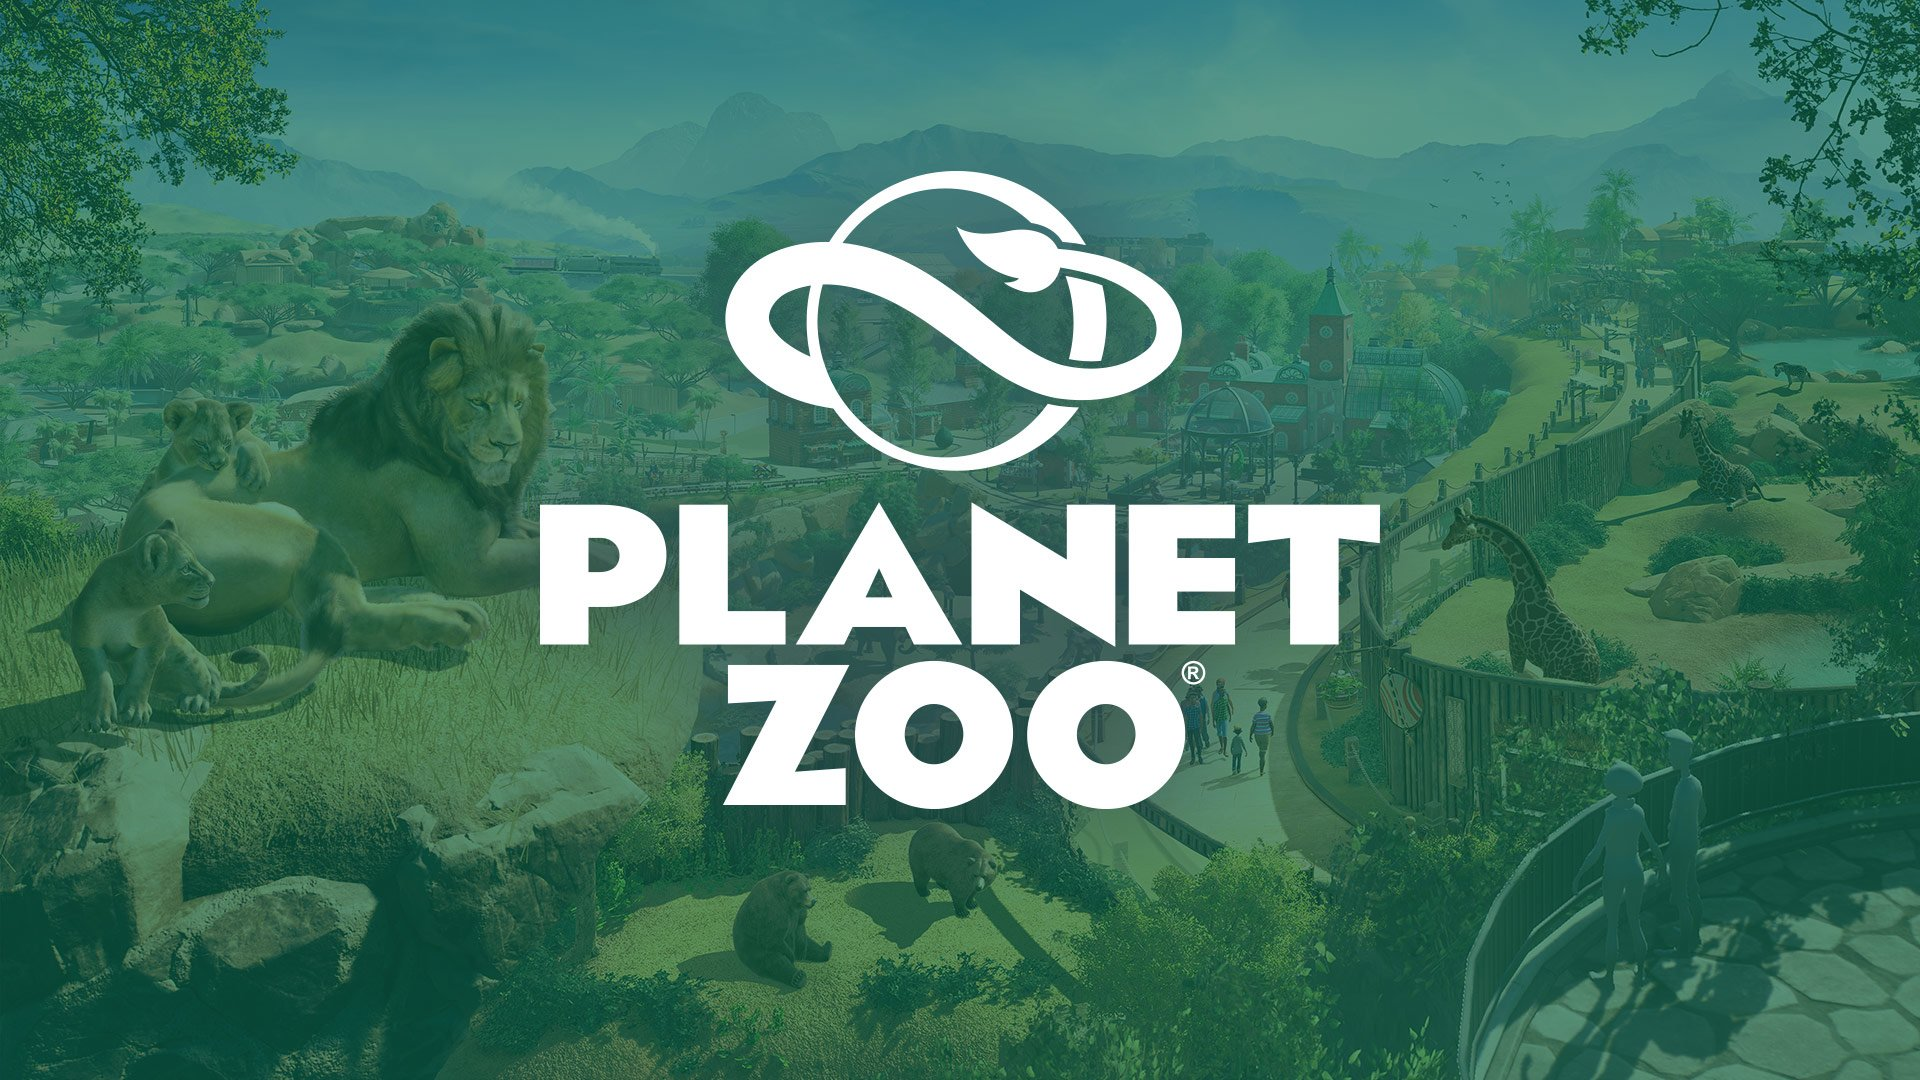 Planet Zoo APK Full Version Free Download (June 2021)